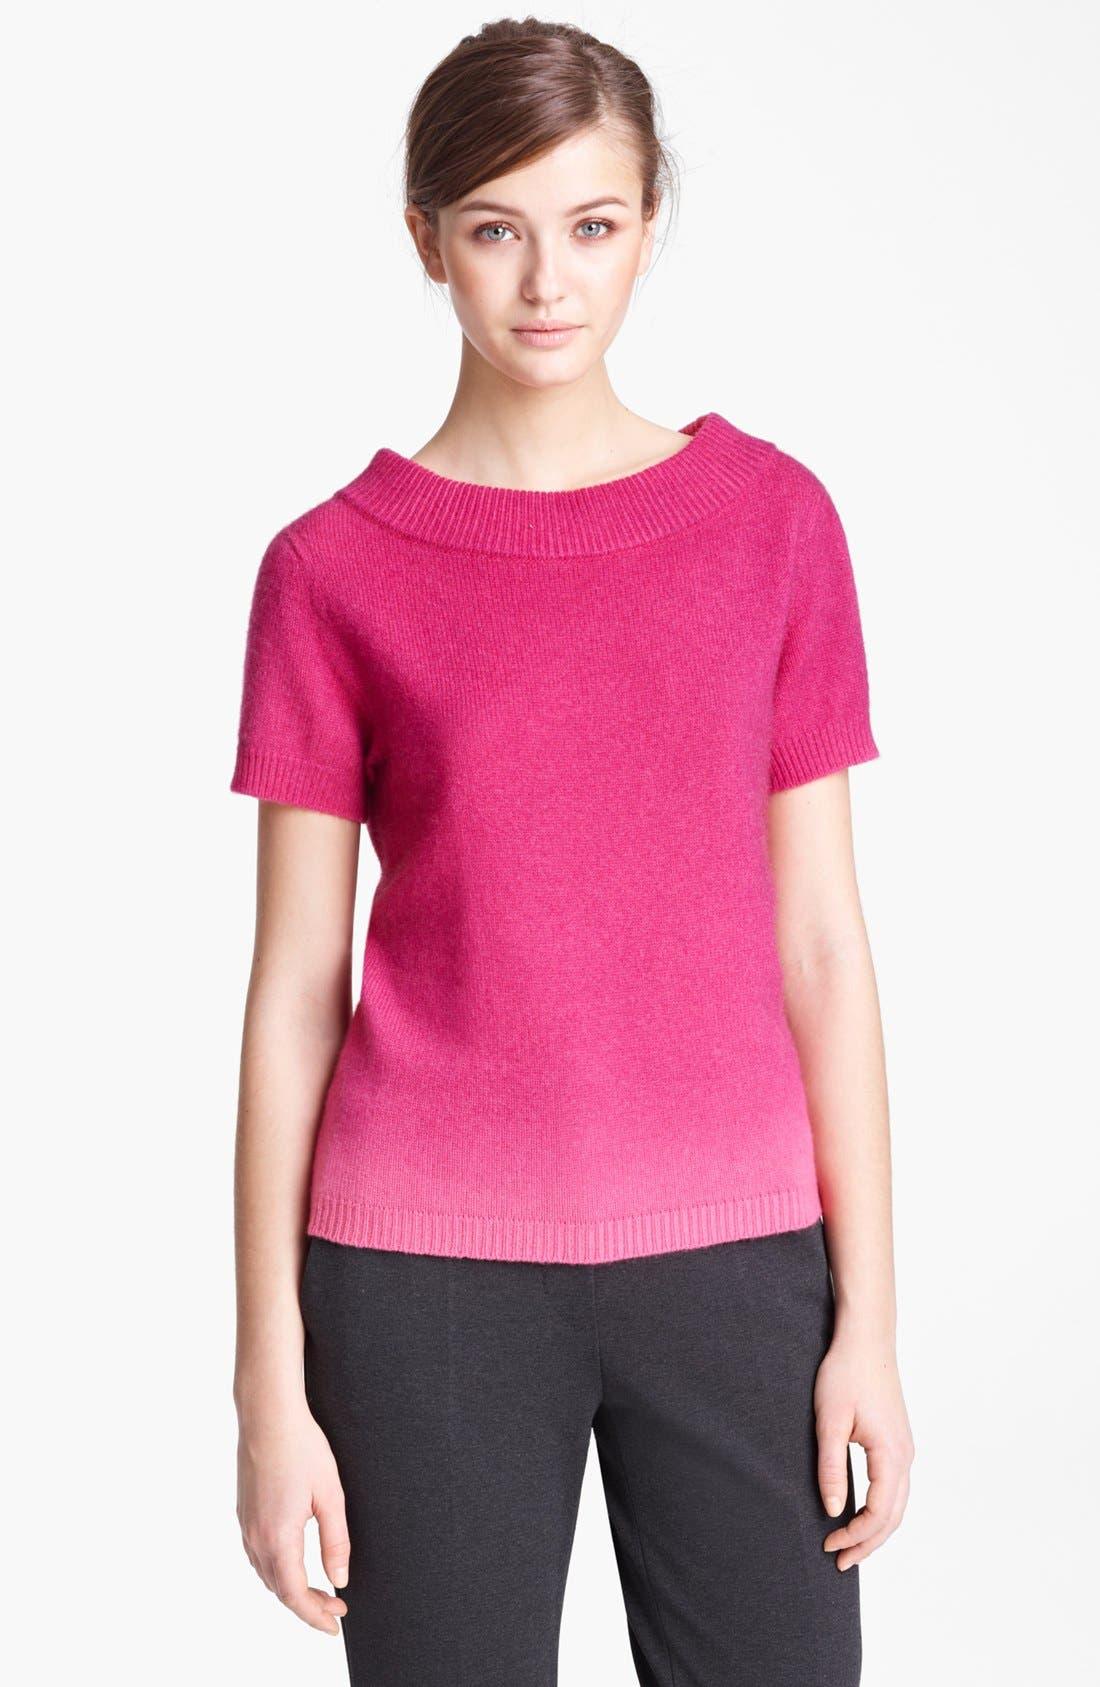 Main Image - Max Mara Ombré Cashmere Sweater